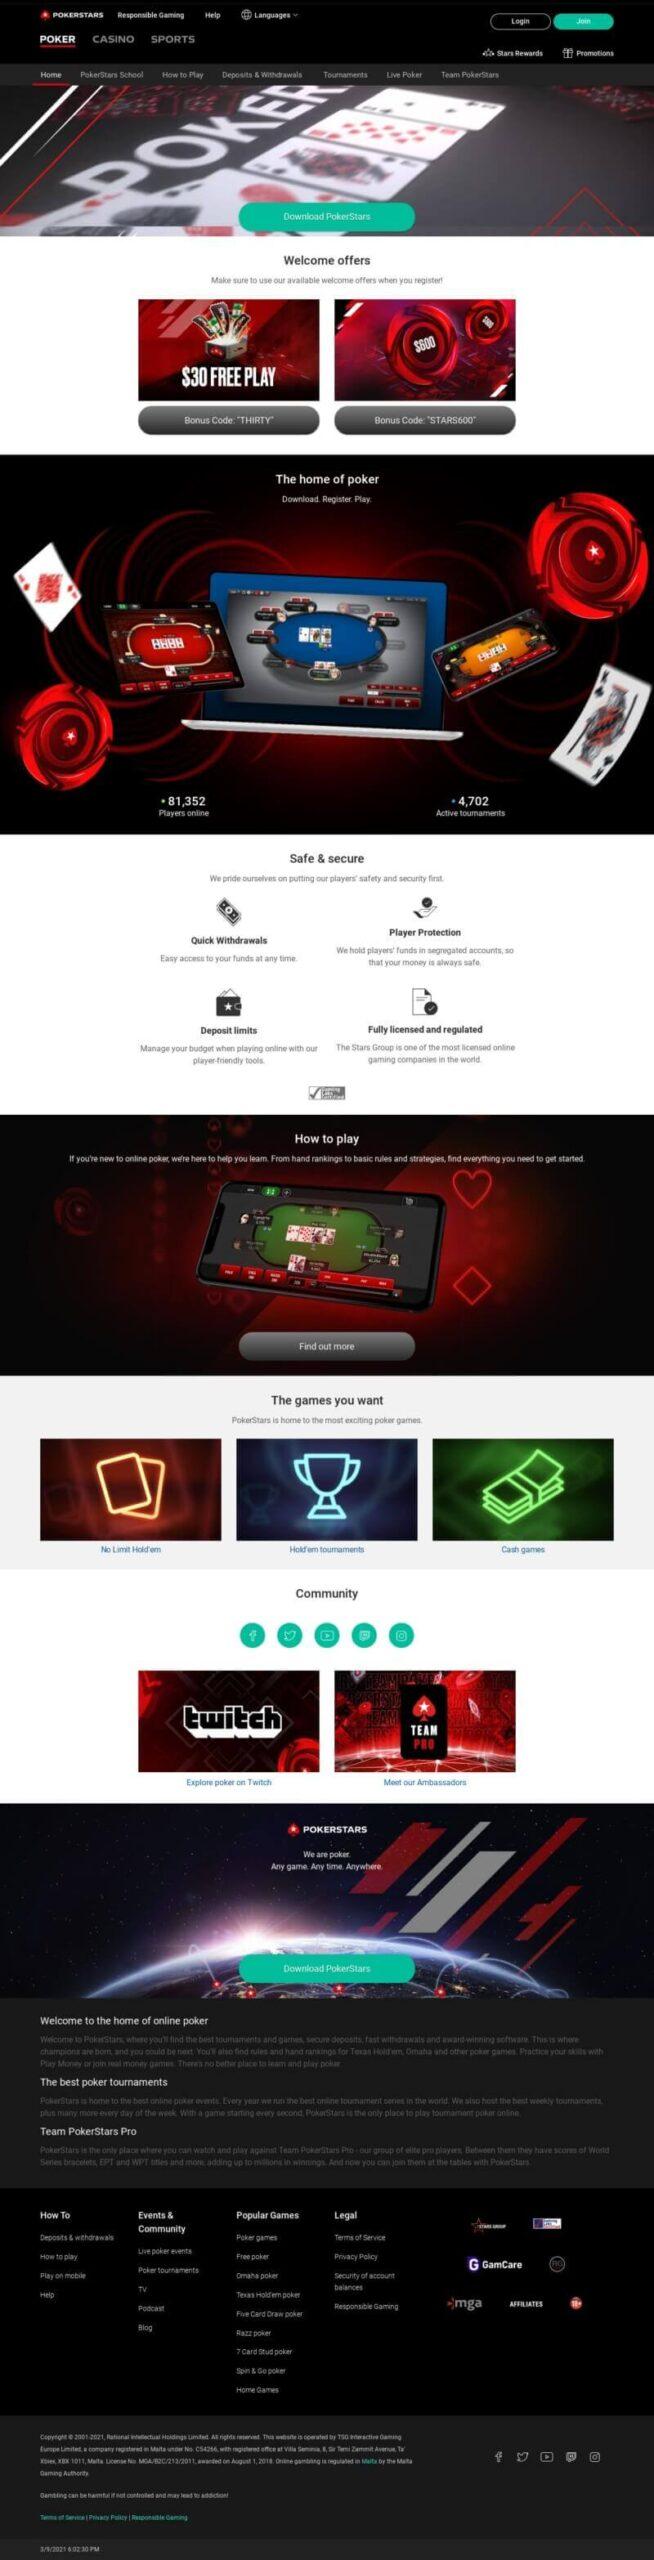 Play Online Poker Games at PokerStars